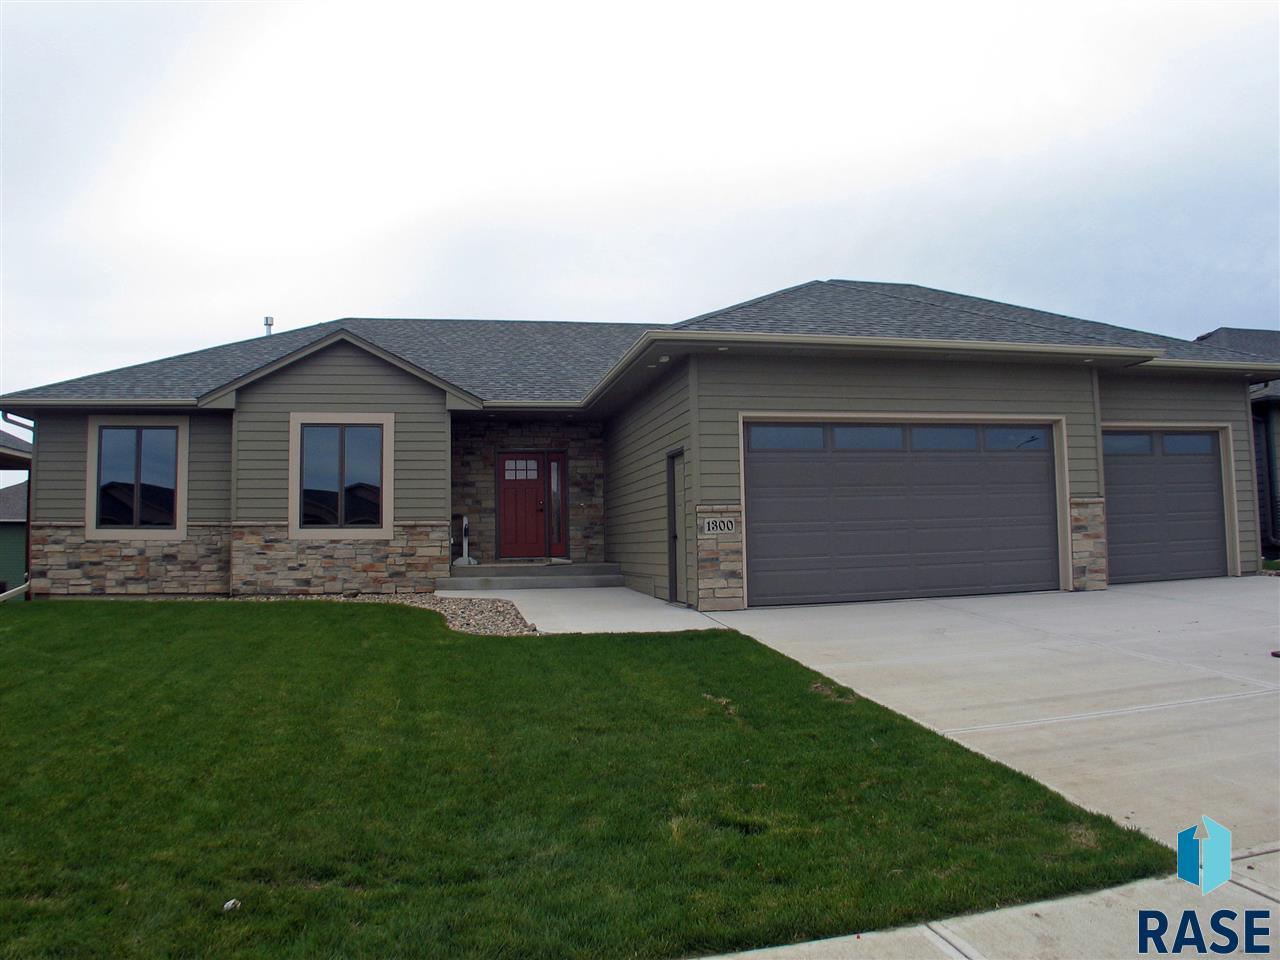 1300 South Wheatland Ave, Sioux Falls, SD 57106